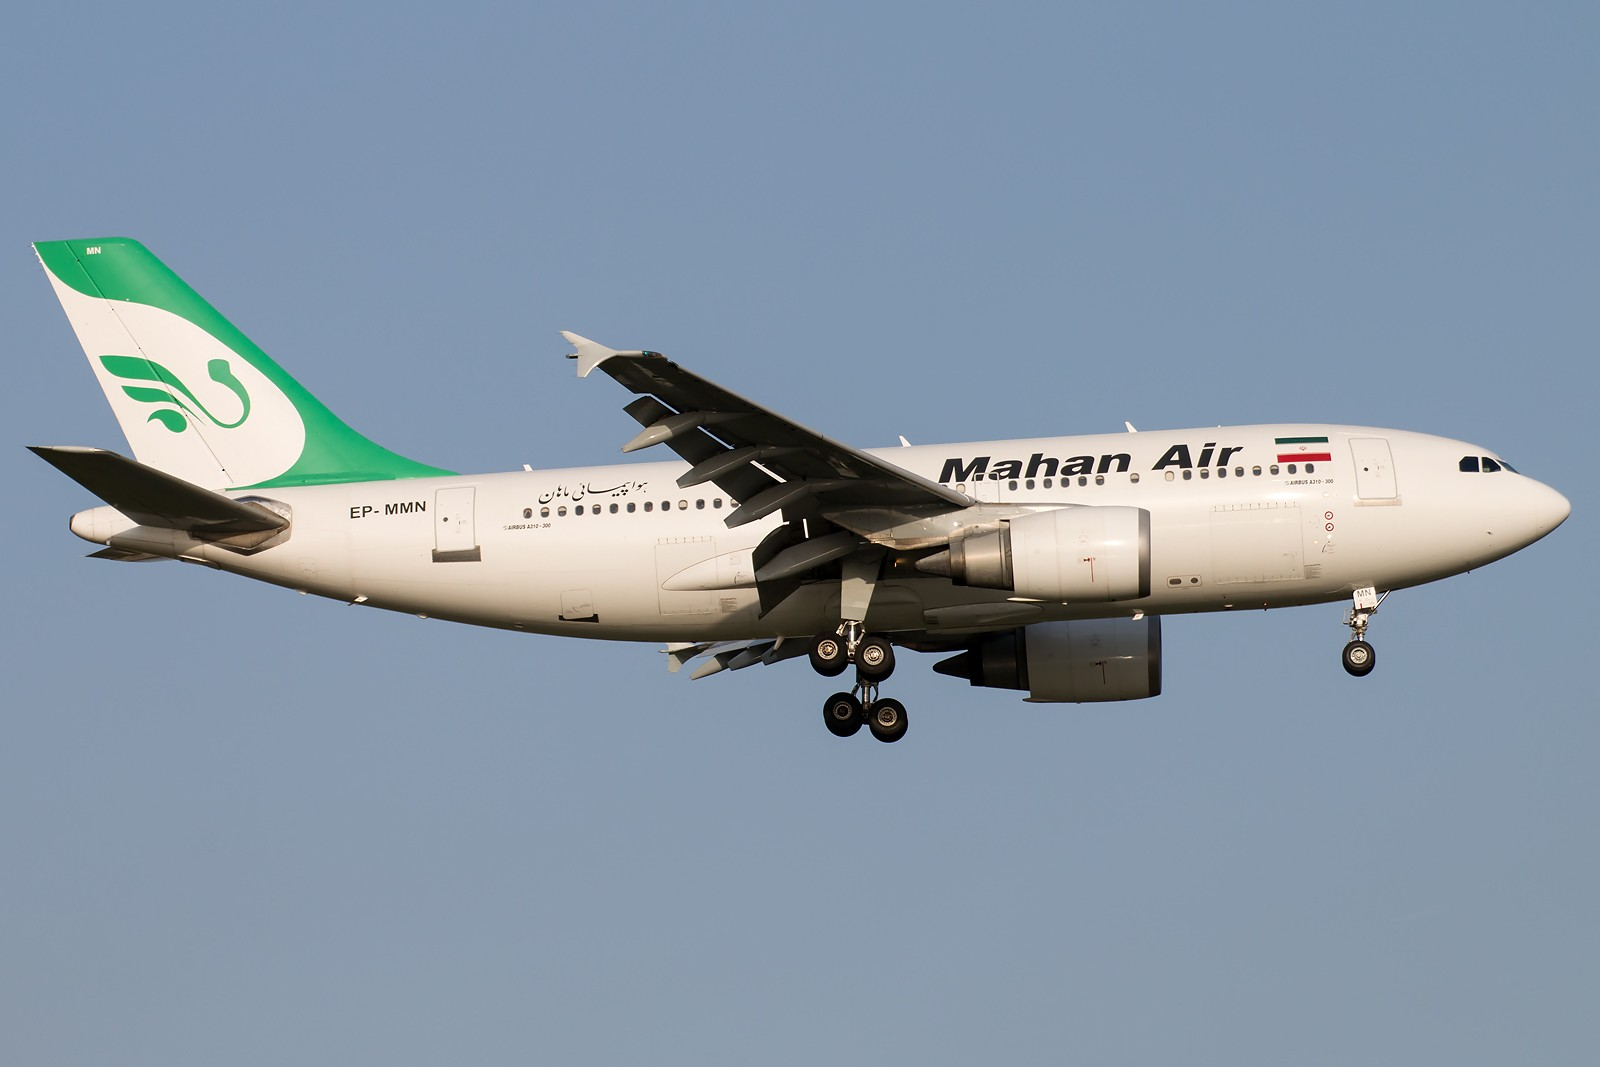 Re:[原创]晨练的季节到了 1600*1067 [8pics] AIRBUS A310-304 EP-MMN 中国北京首都国际机场